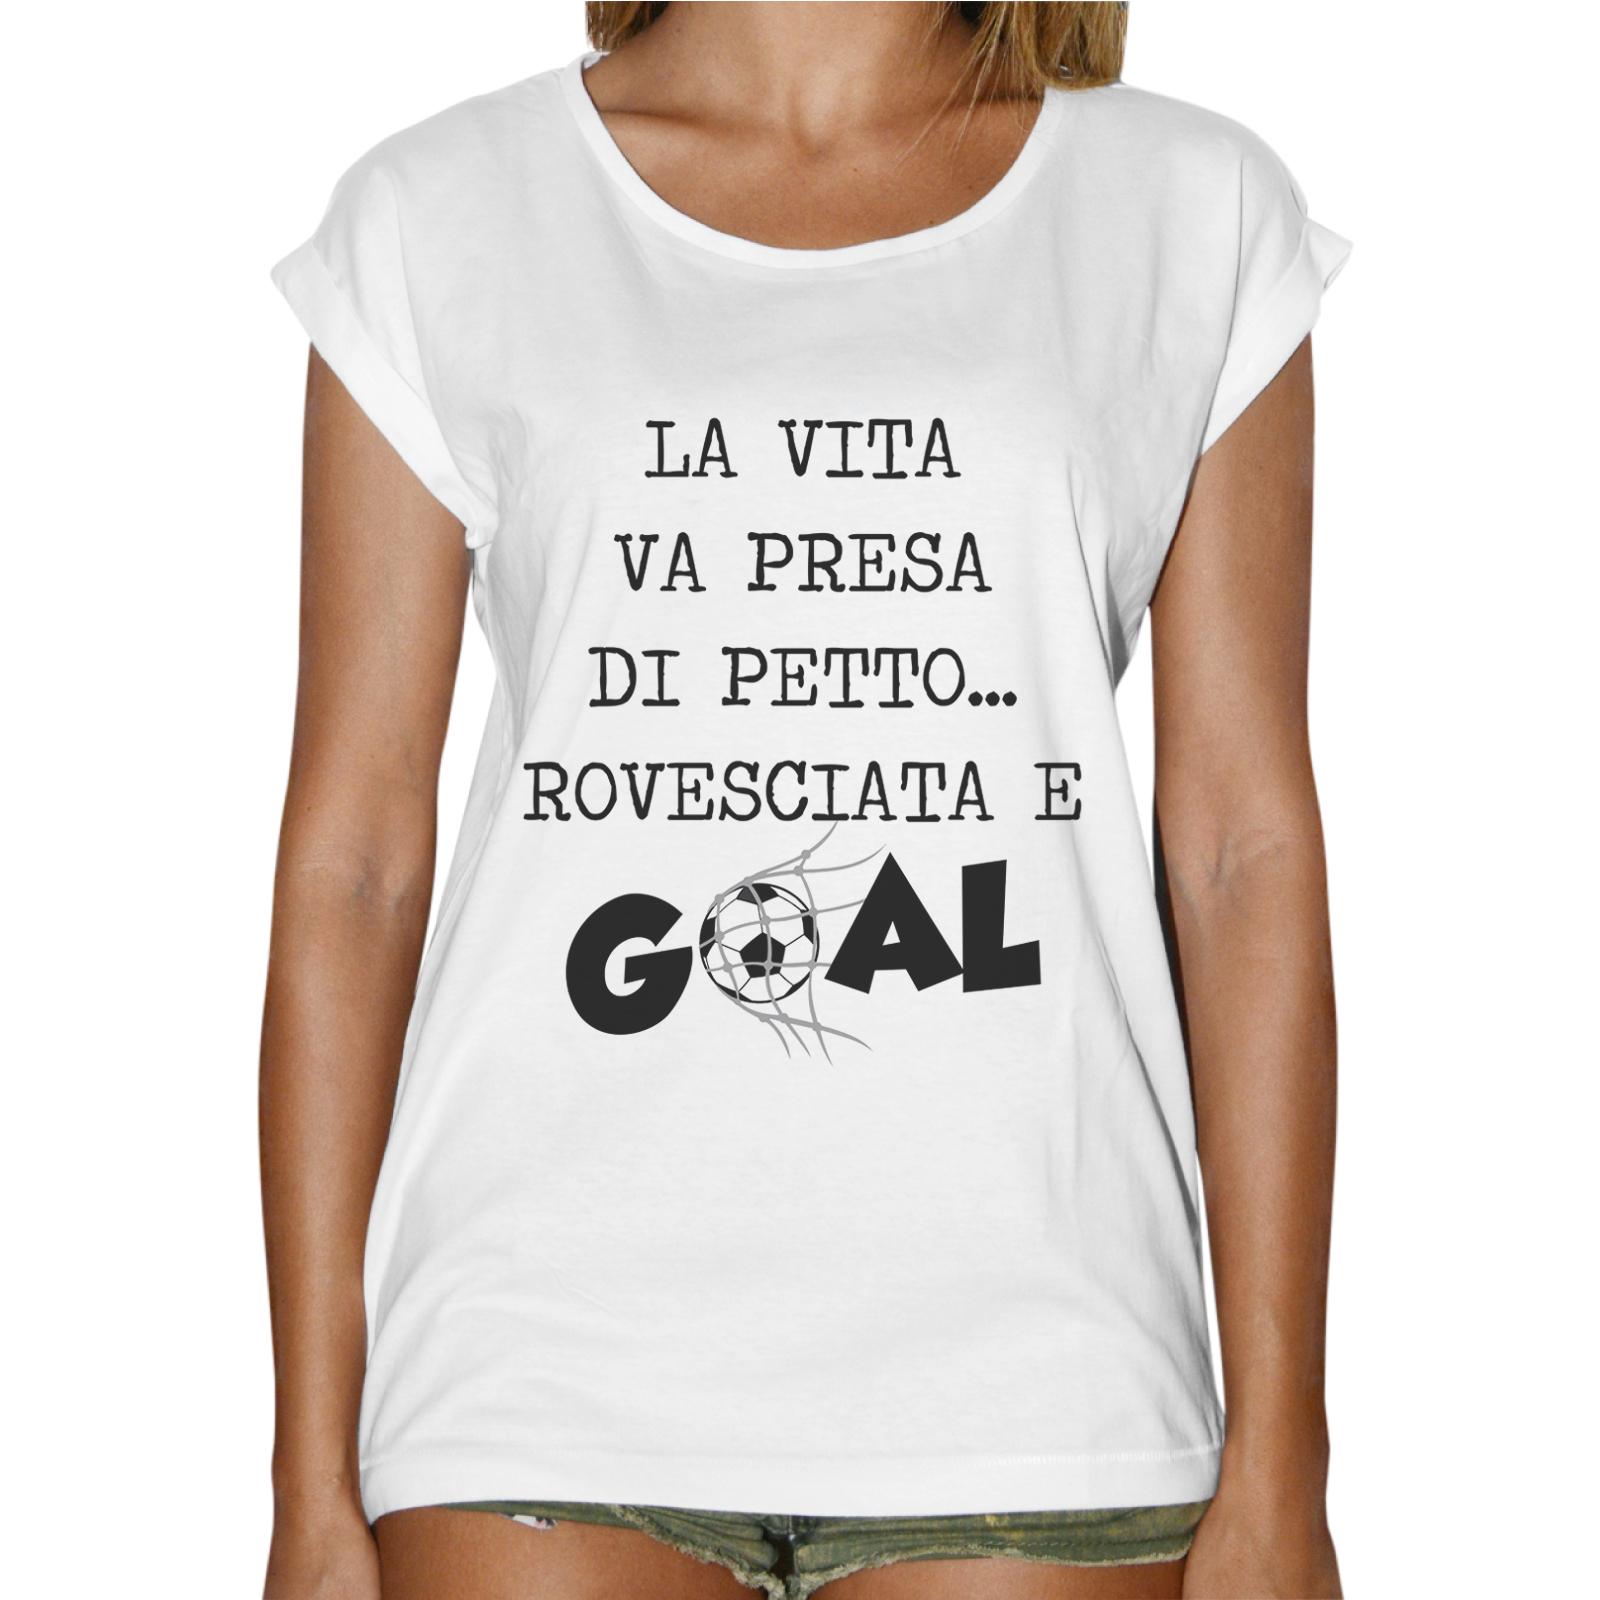 T-Shirt Donna Fashion PETTO ROVESCIATA GOAL